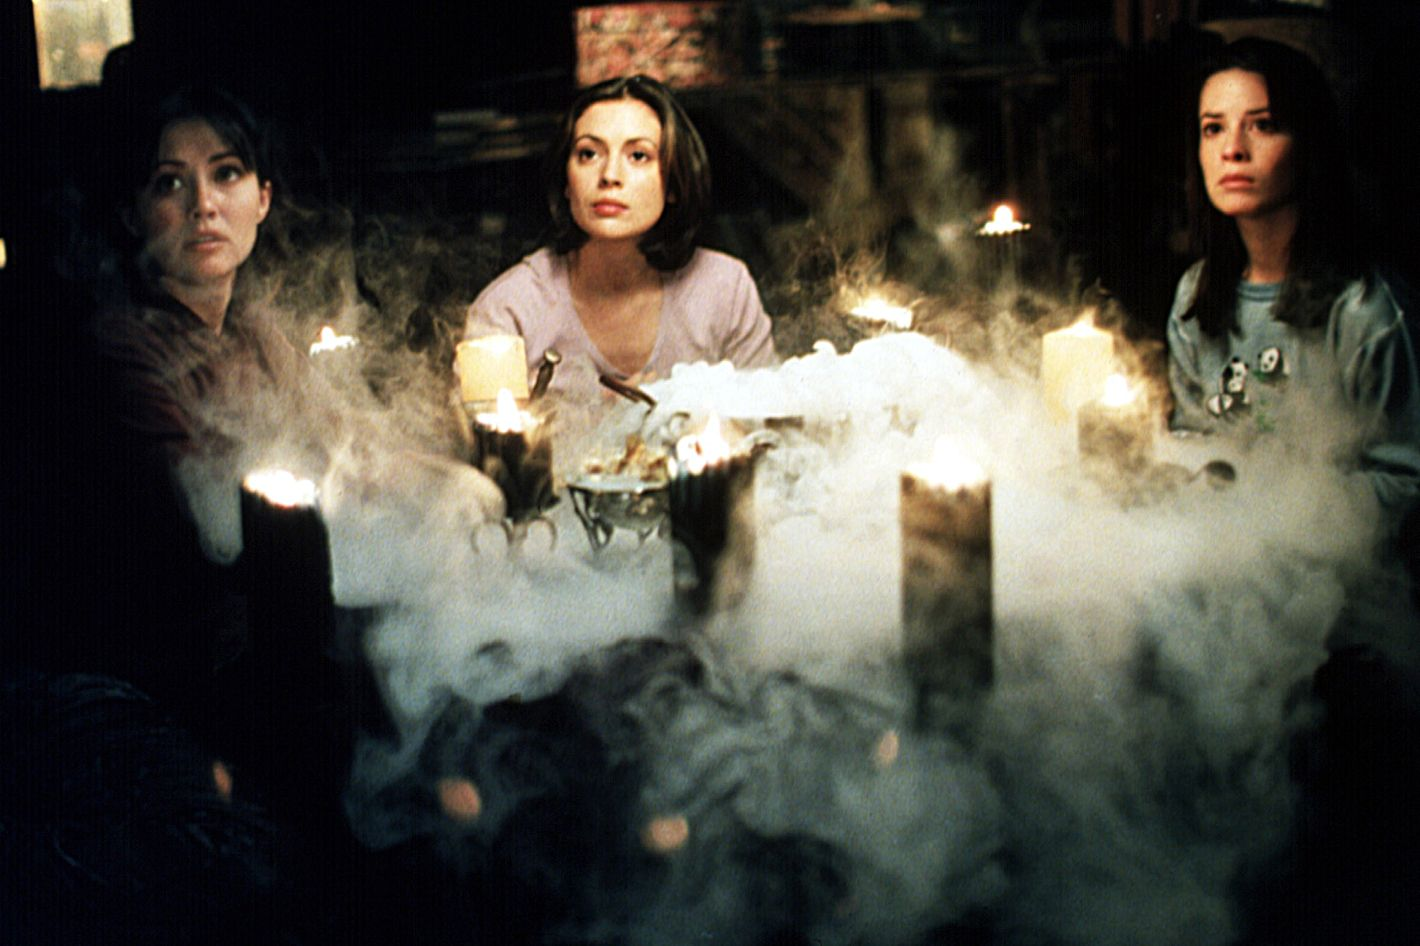 161 Charmed Demons, Warlocks, and Baddies, Ranked by Scariness